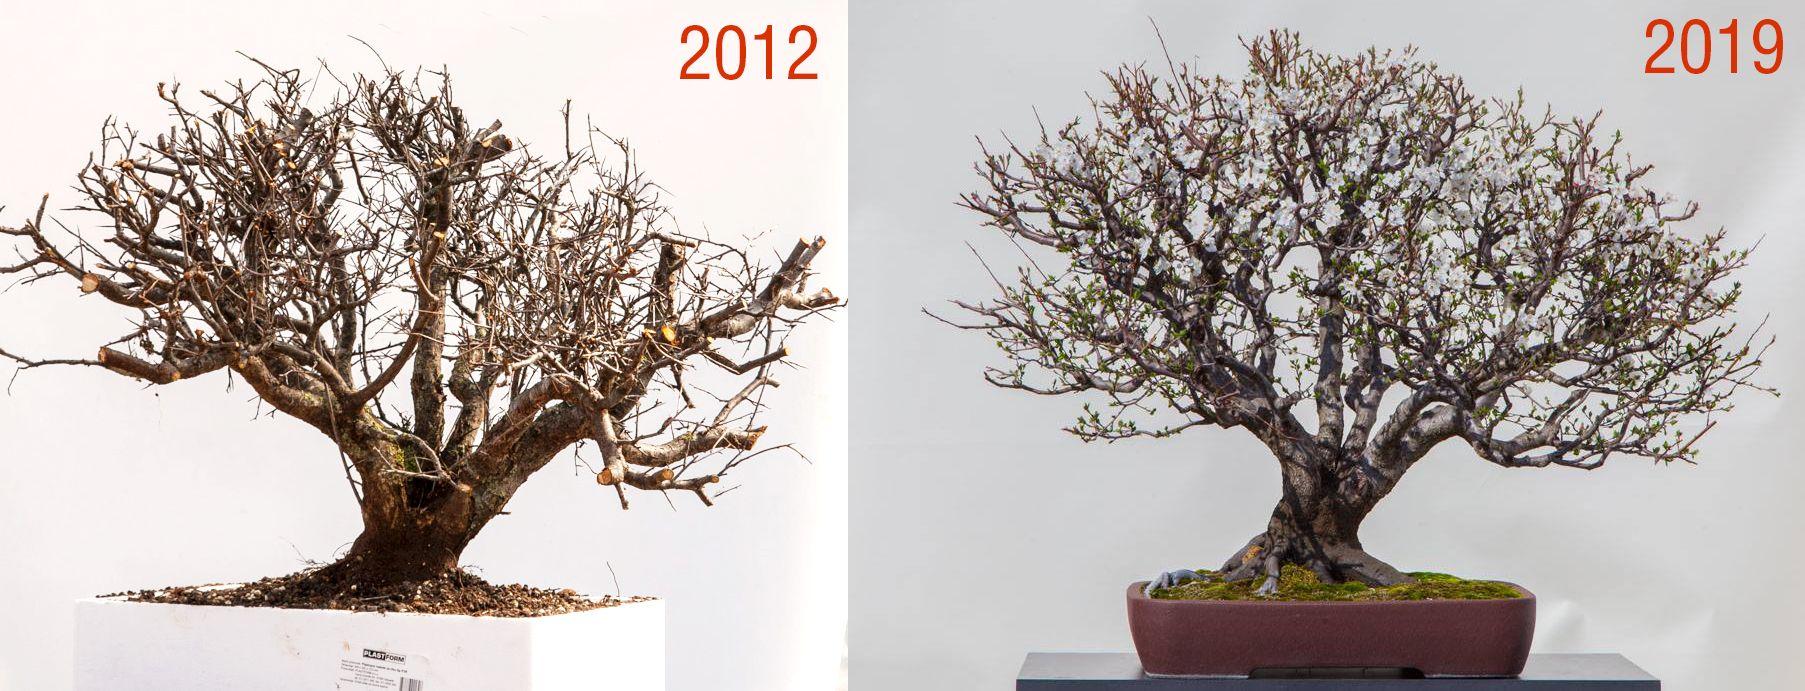 Prunus Cerasifera By Marija Hajdic Prunus Plants Bonsai